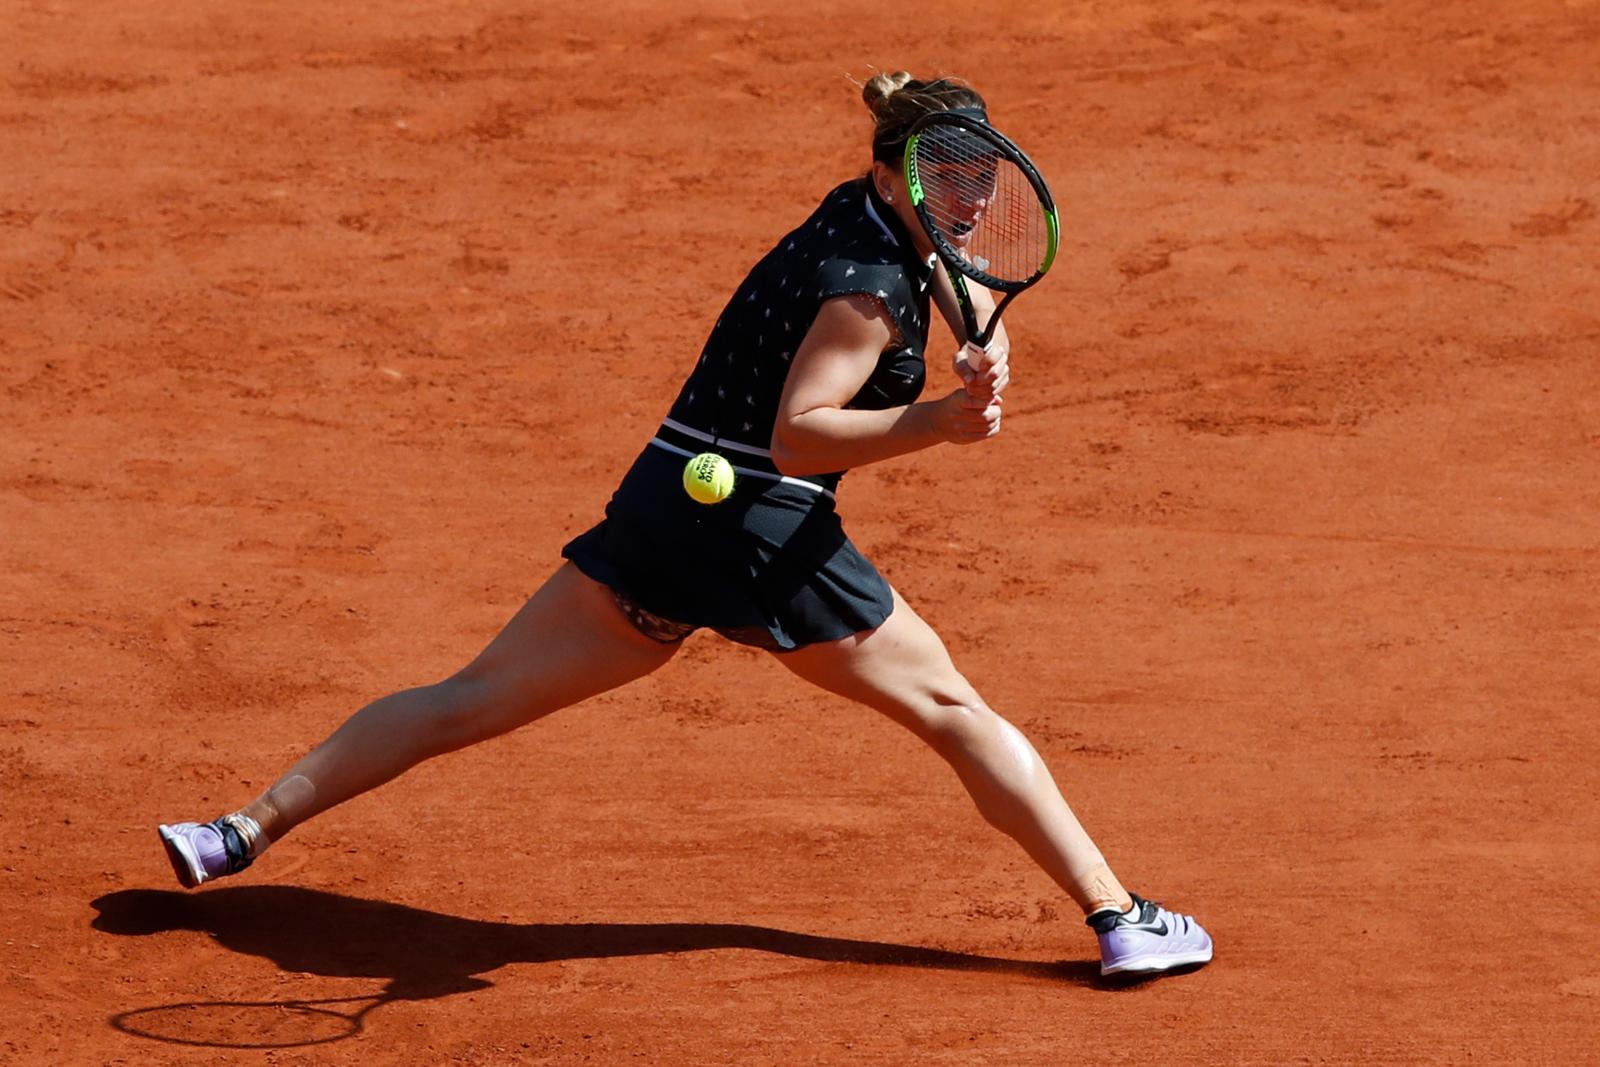 Romania's Simona Halep plays a shot against Ukraine's Lesia Tsurenko during their third round match of the French Open tennis tournament at the Roland Garros stadium in Paris, Saturday, June 1, 2019. AP